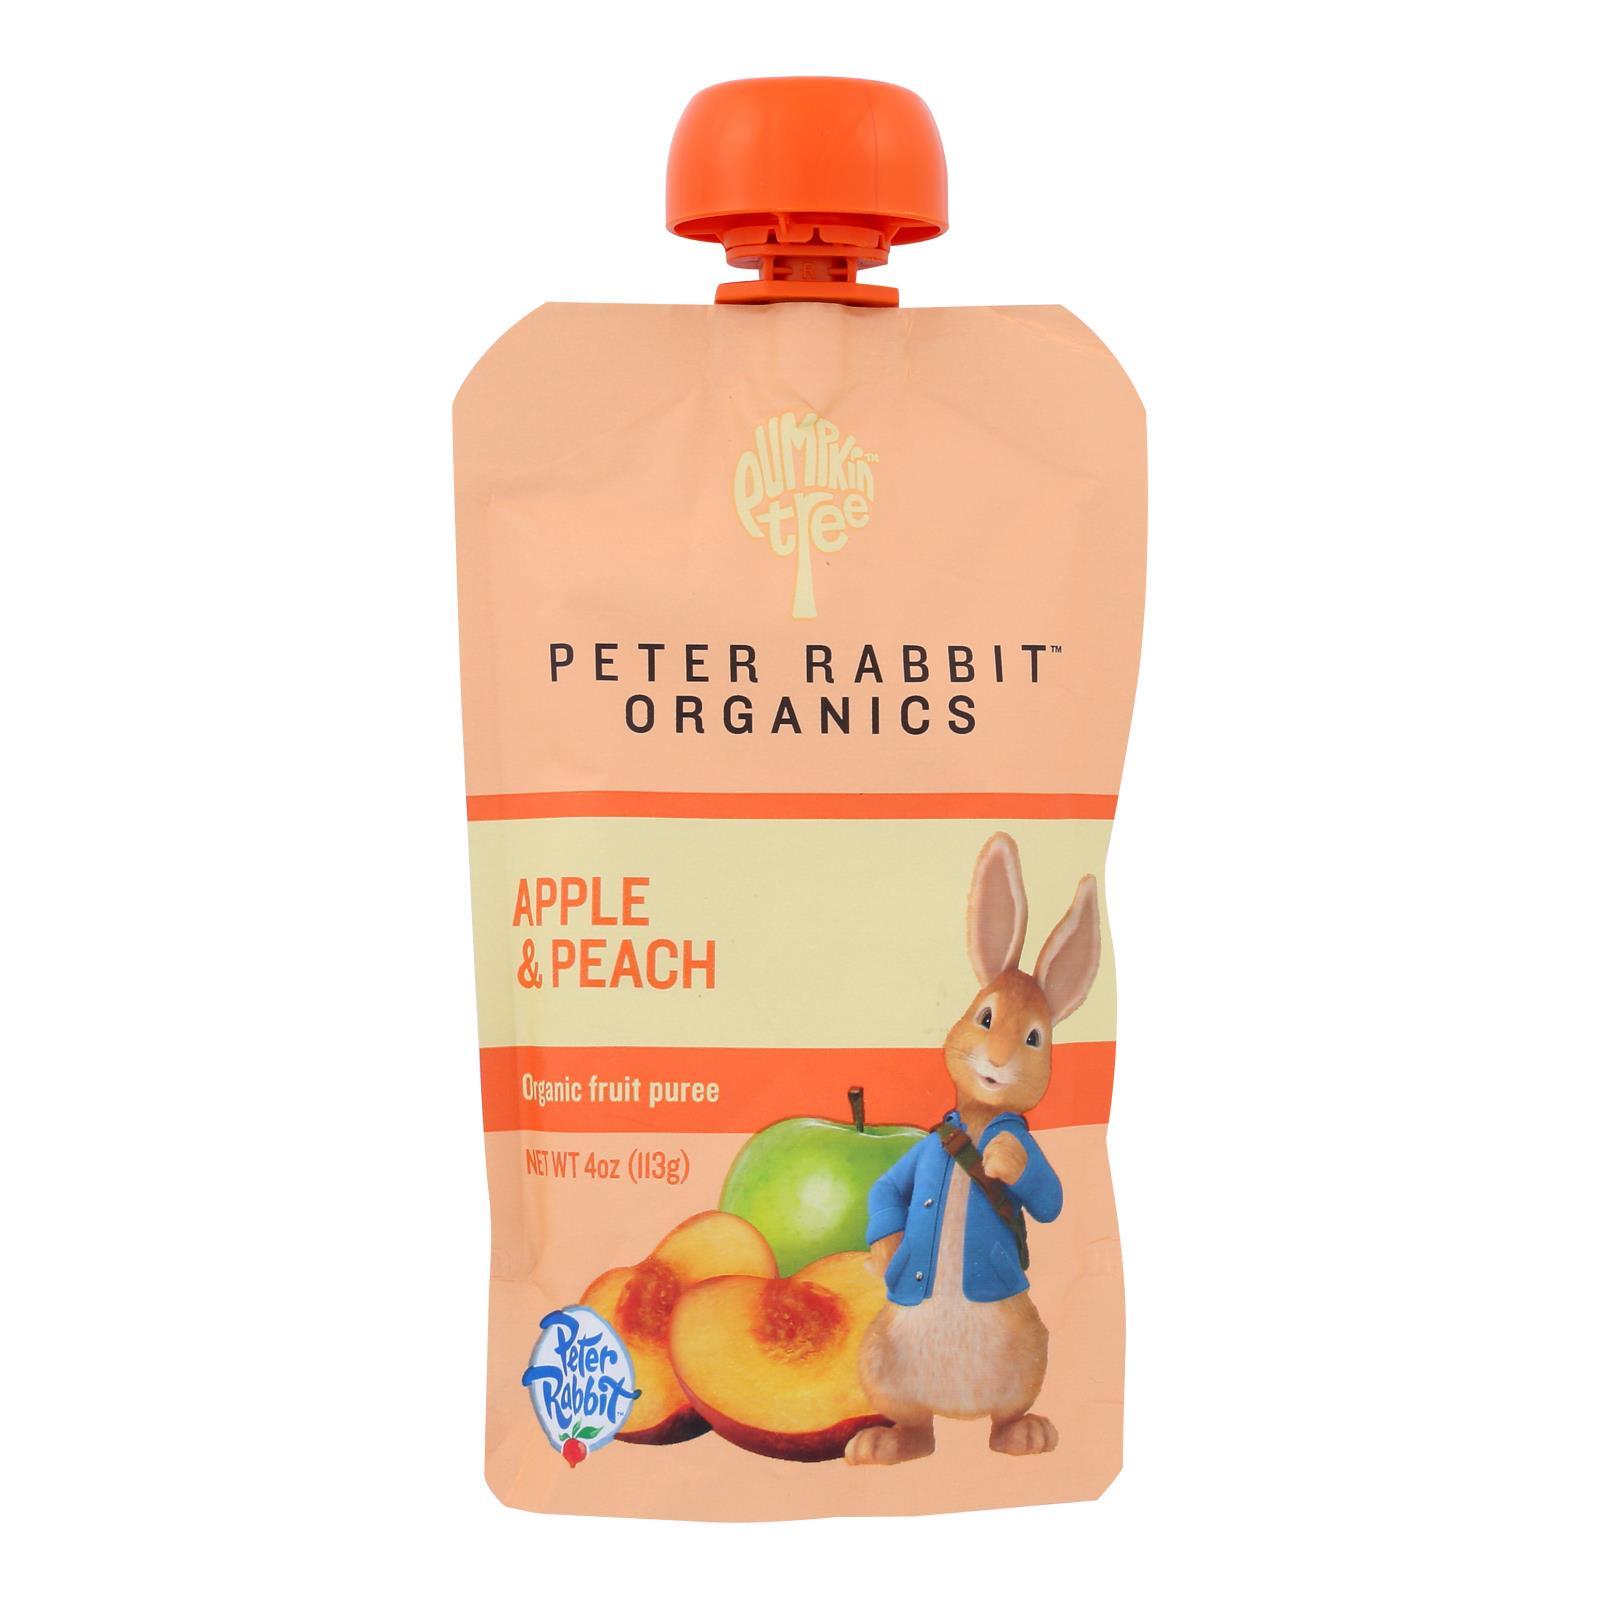 Peter Rabbit Organics Fruit Snacks - Peach and Apple - Case of 10 - 4 oz.